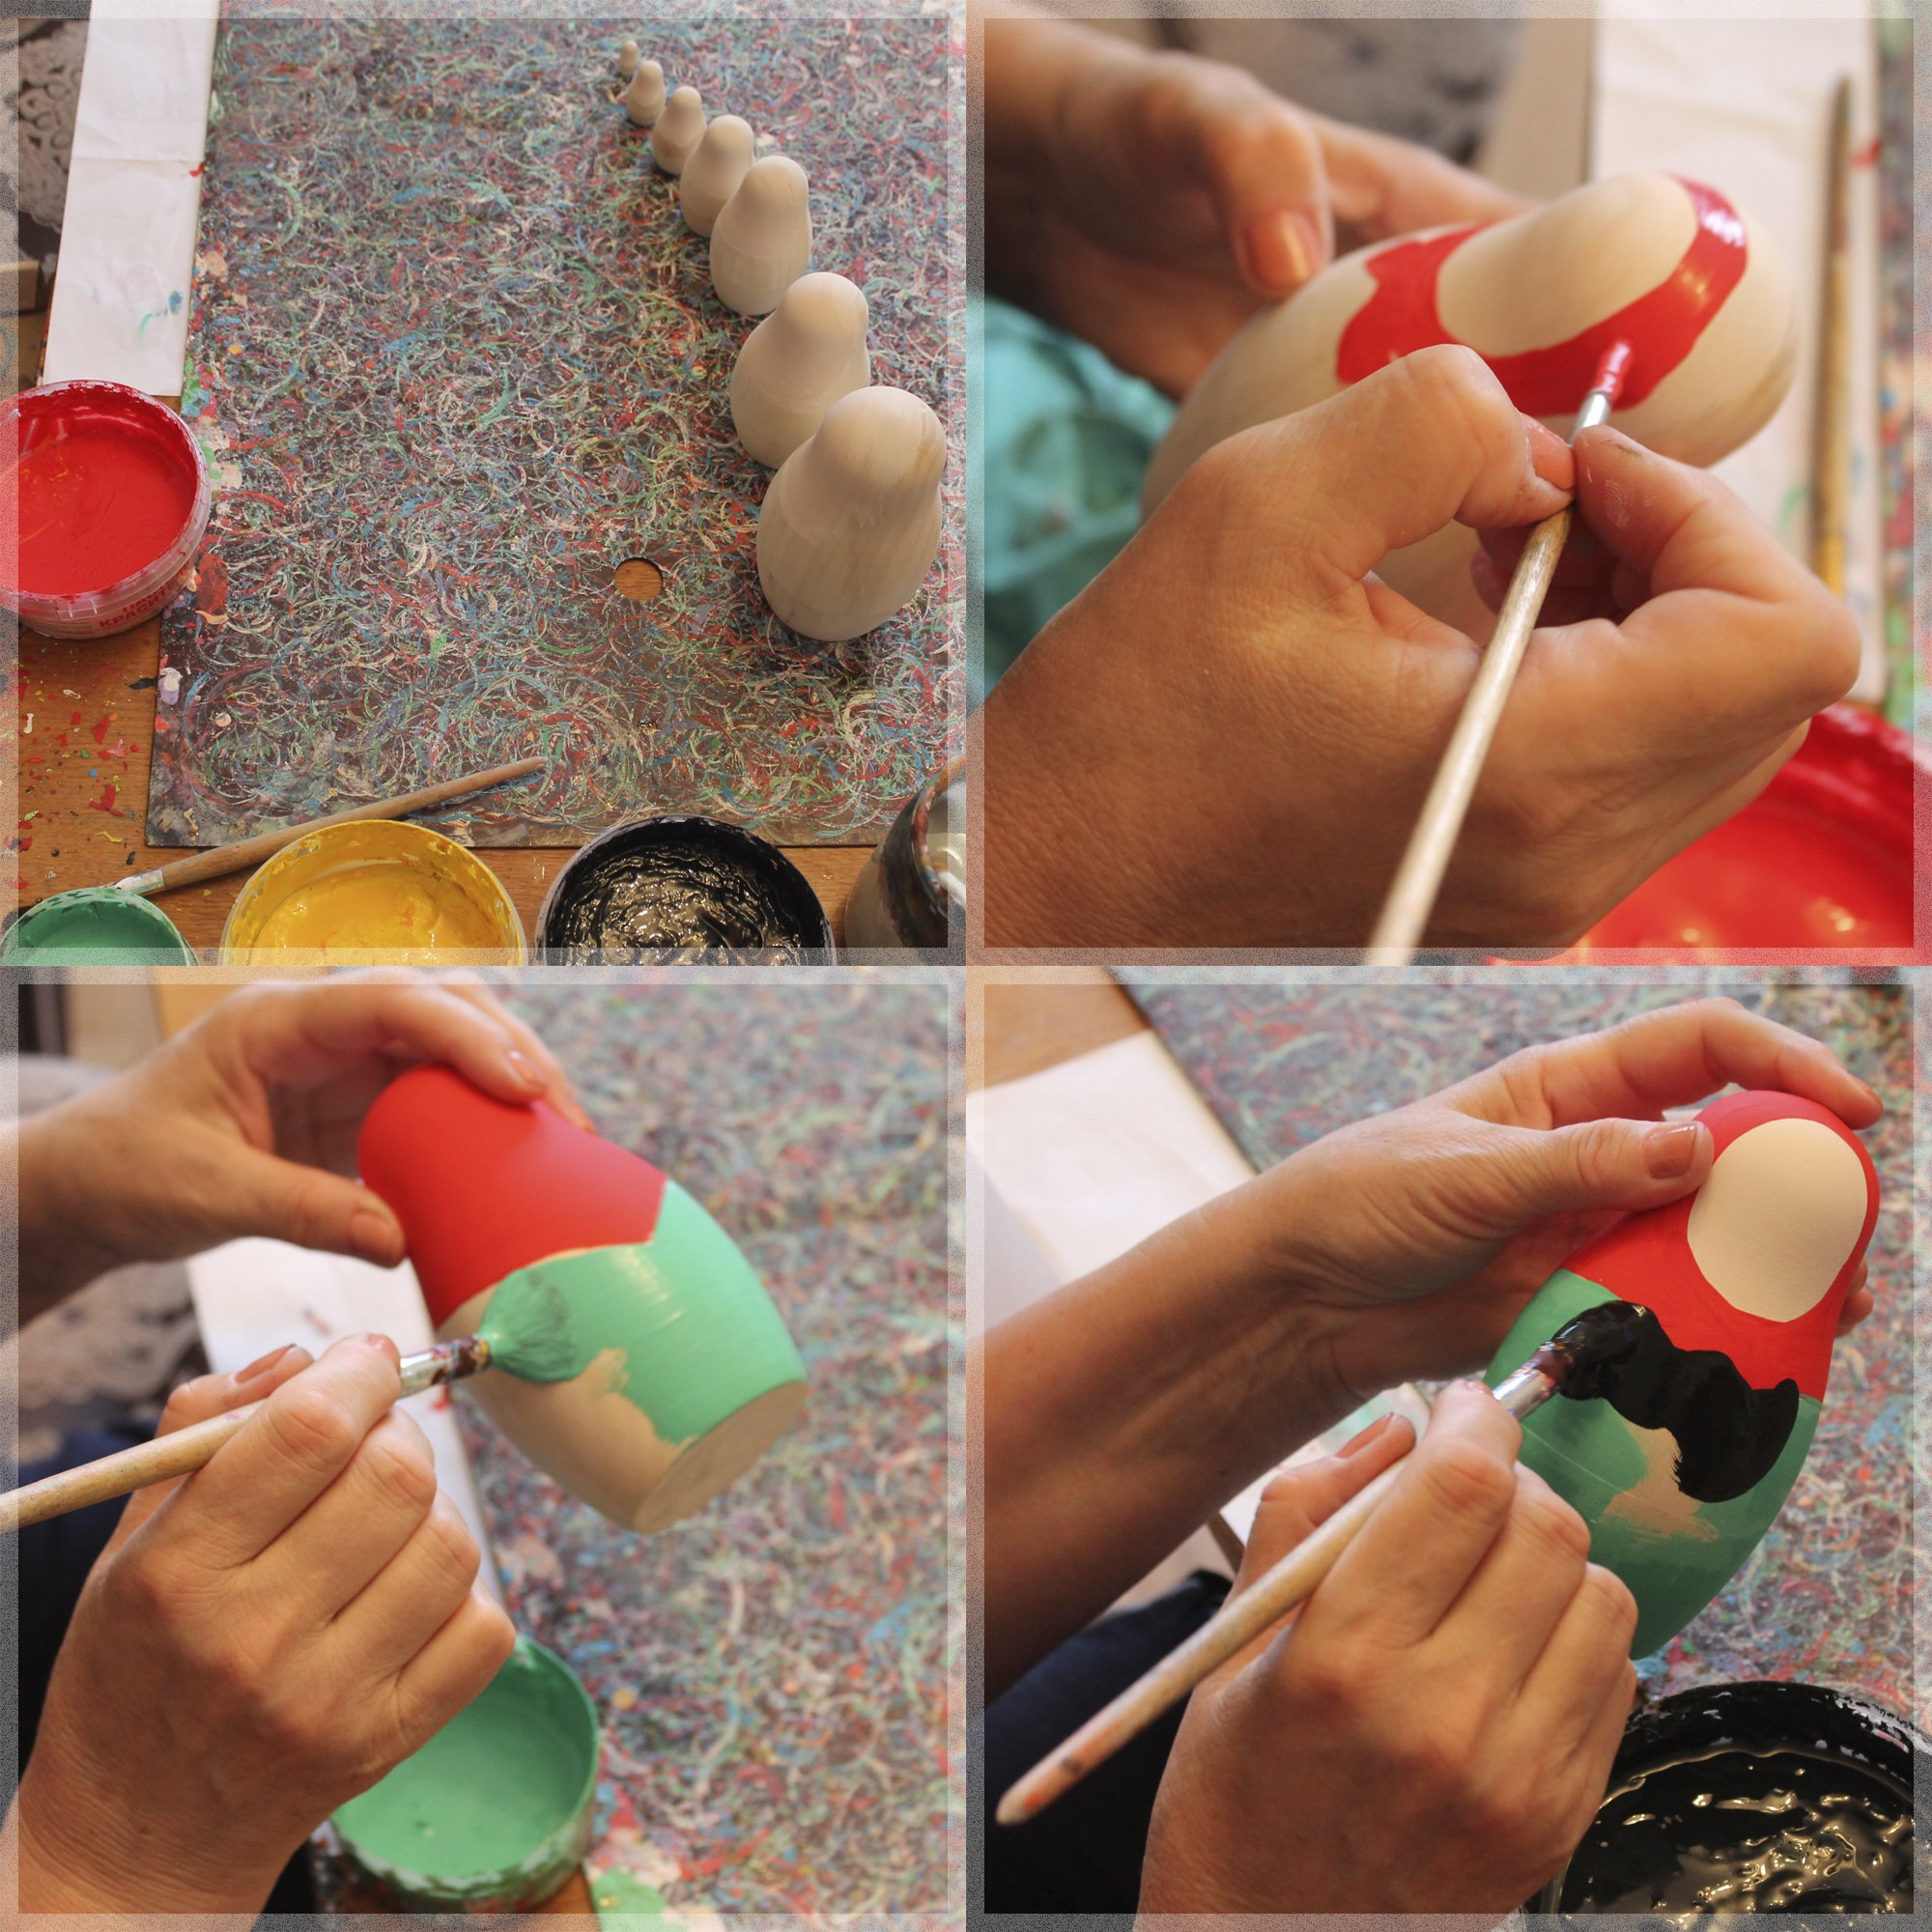 Lot 10 Unpainted Stacking Nesting Dolls Set 4 pcs - DIY Gifts by MATRYOSHKA&HANDICRAFT (Image #2)